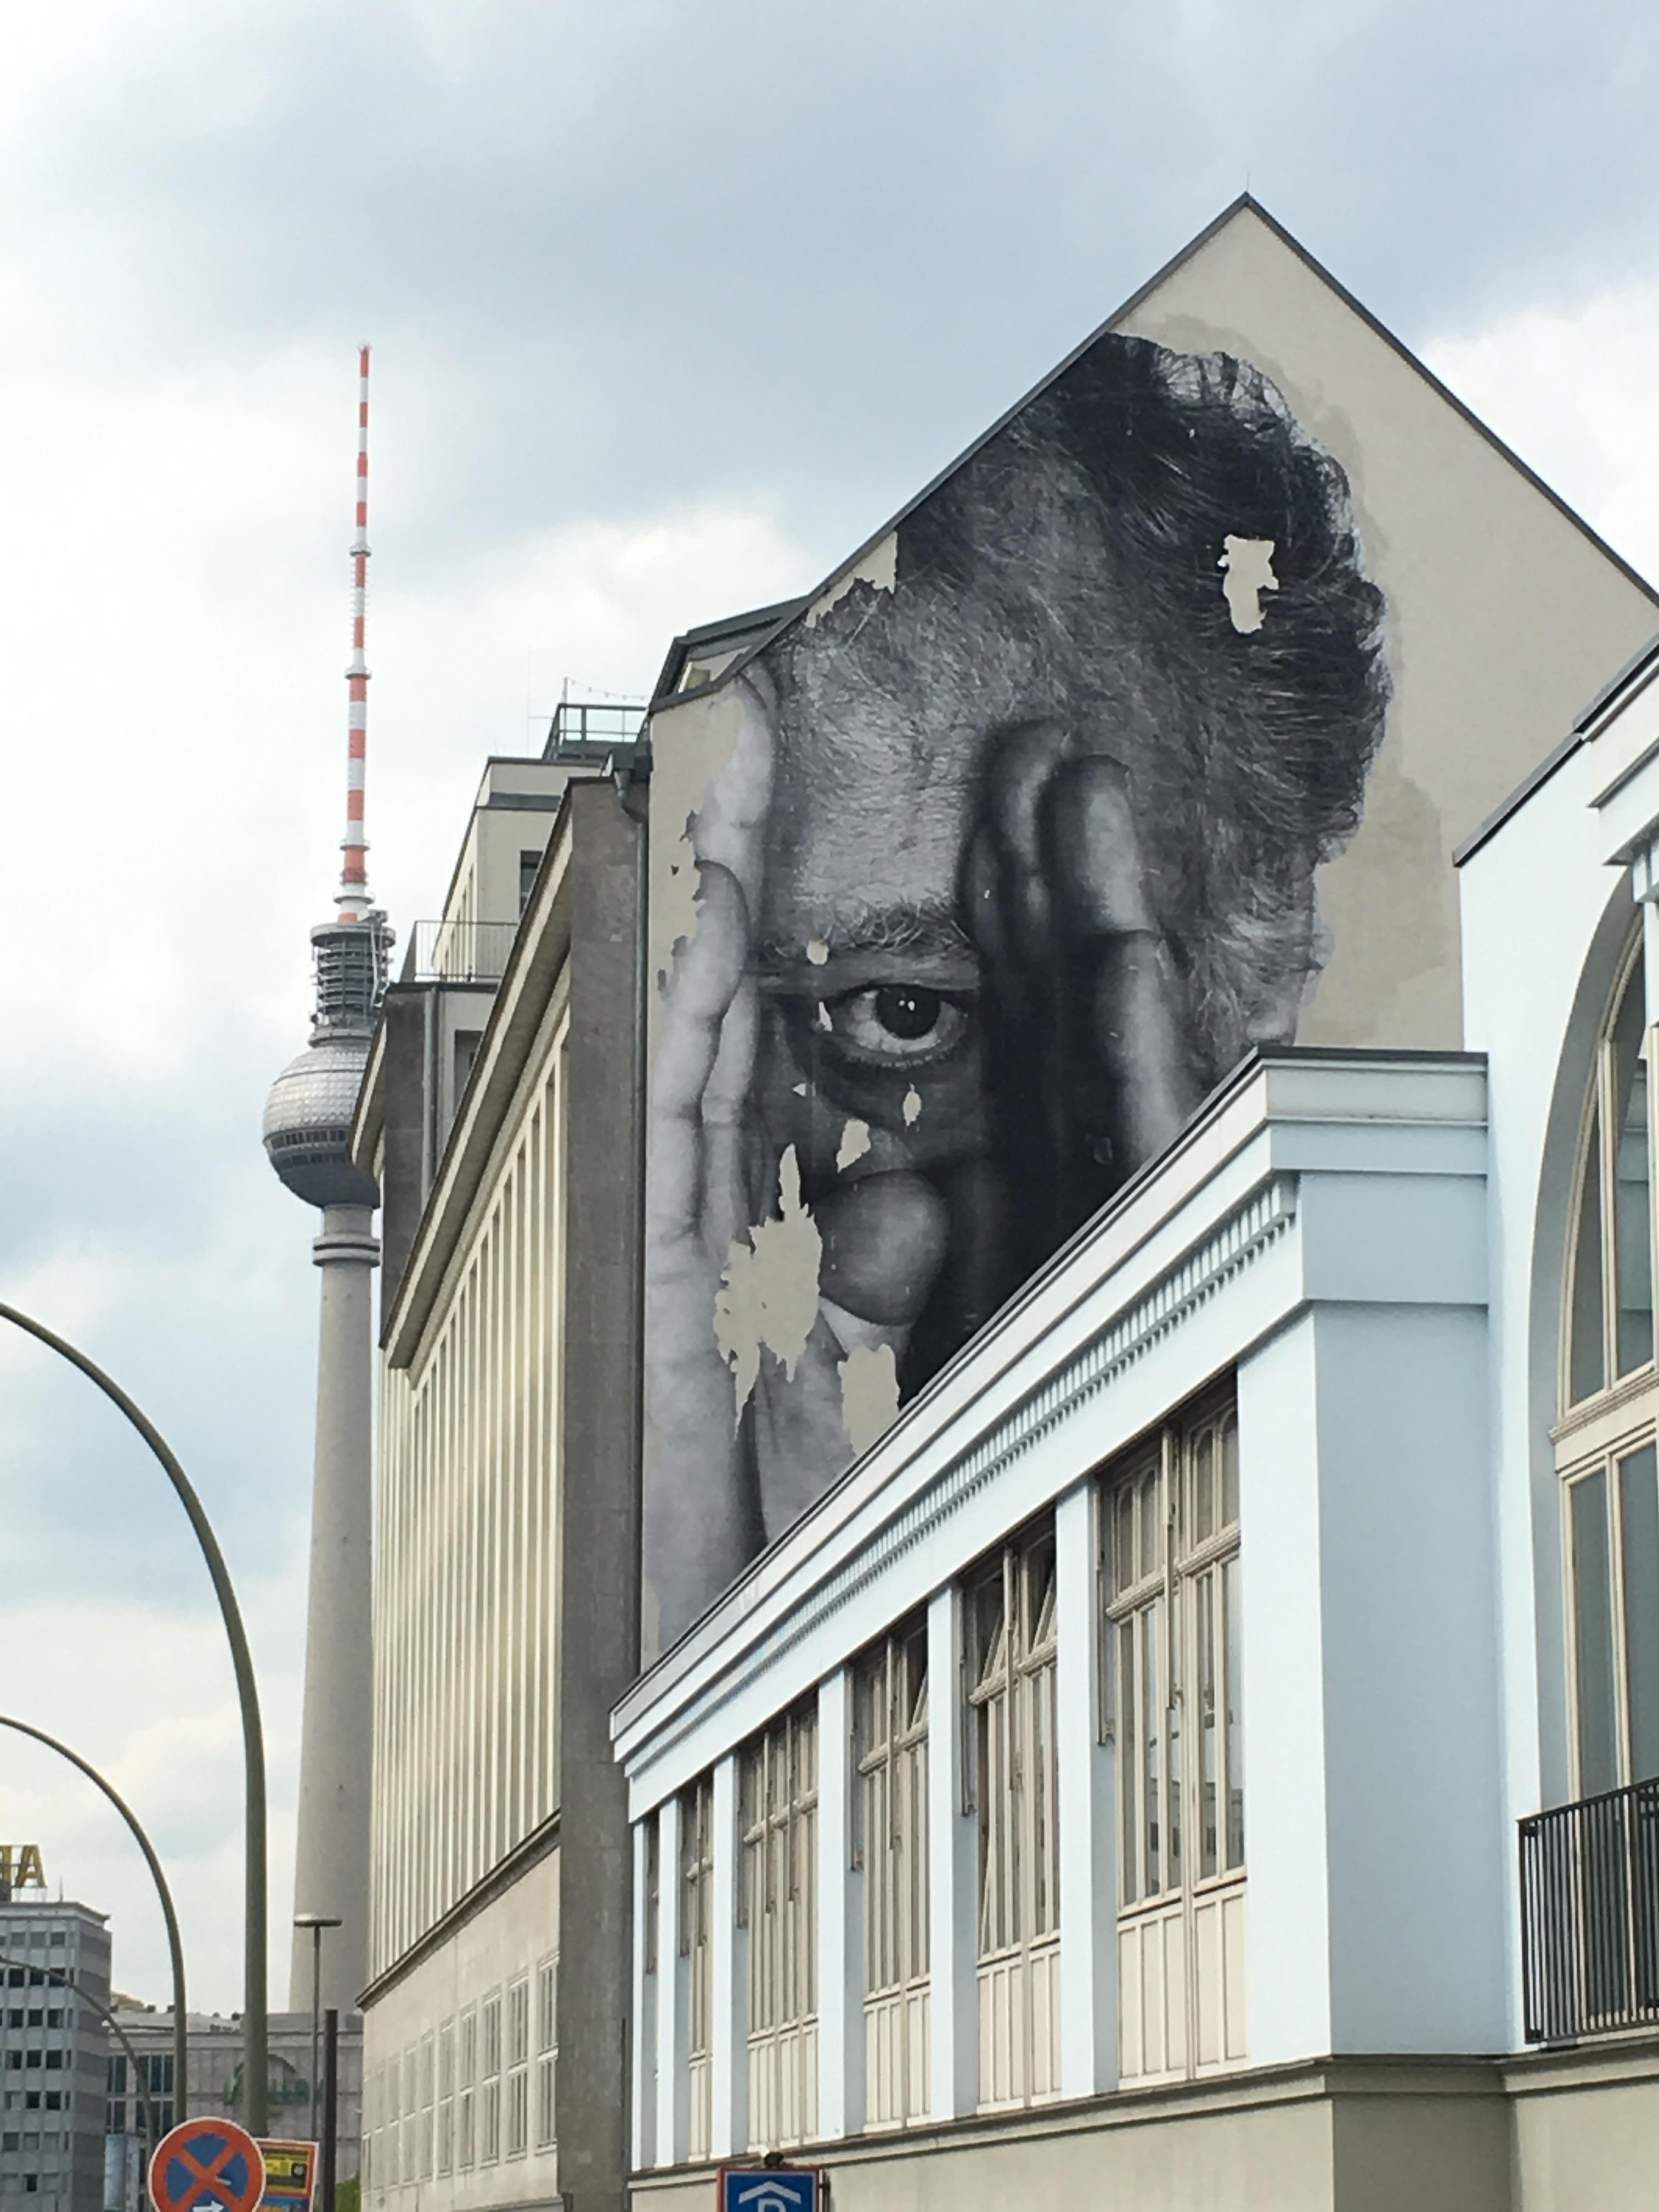 Dirne aus Berlin